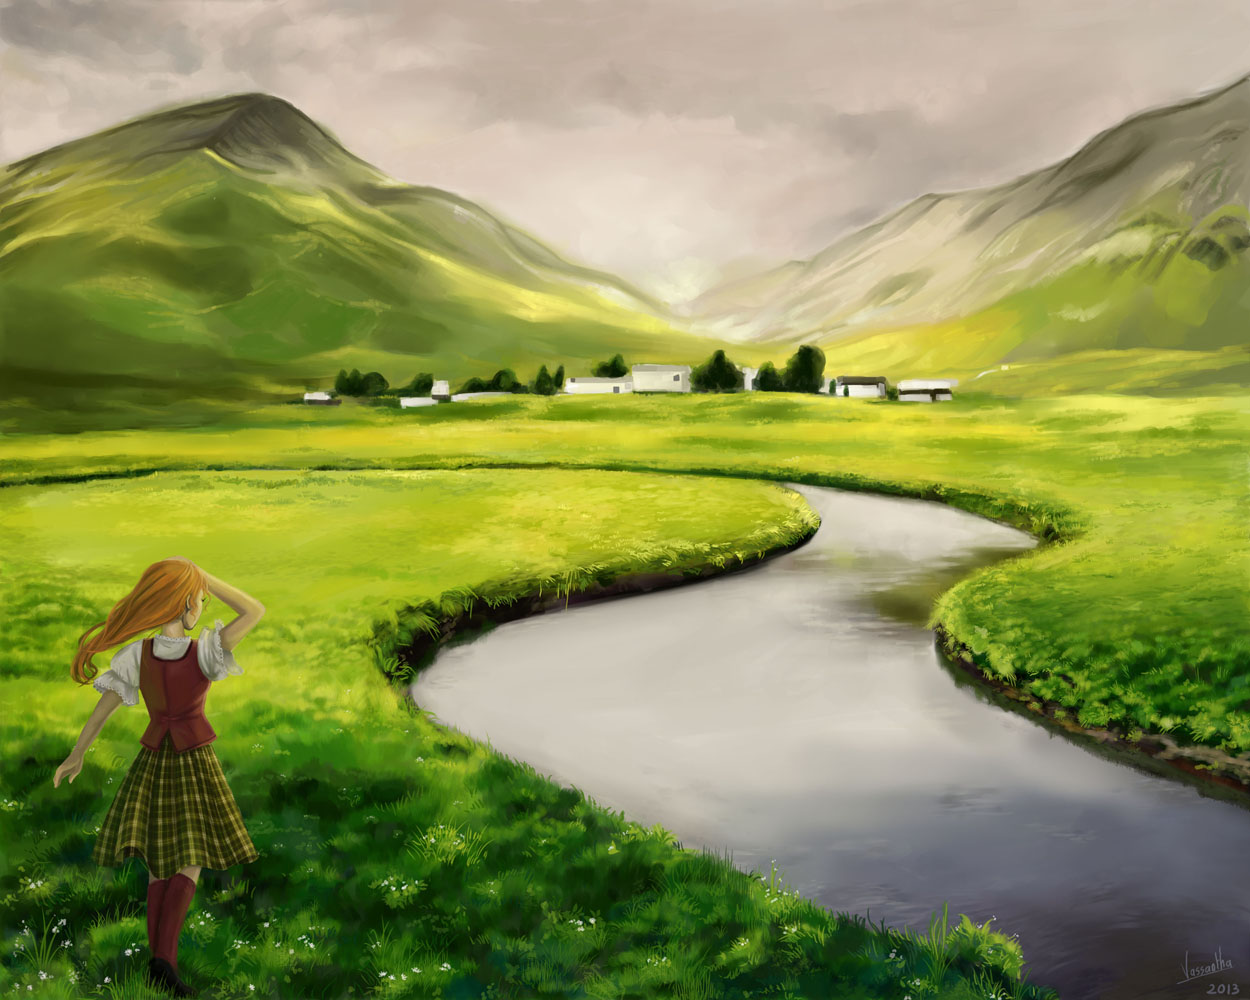 Green Valley by Vassantha